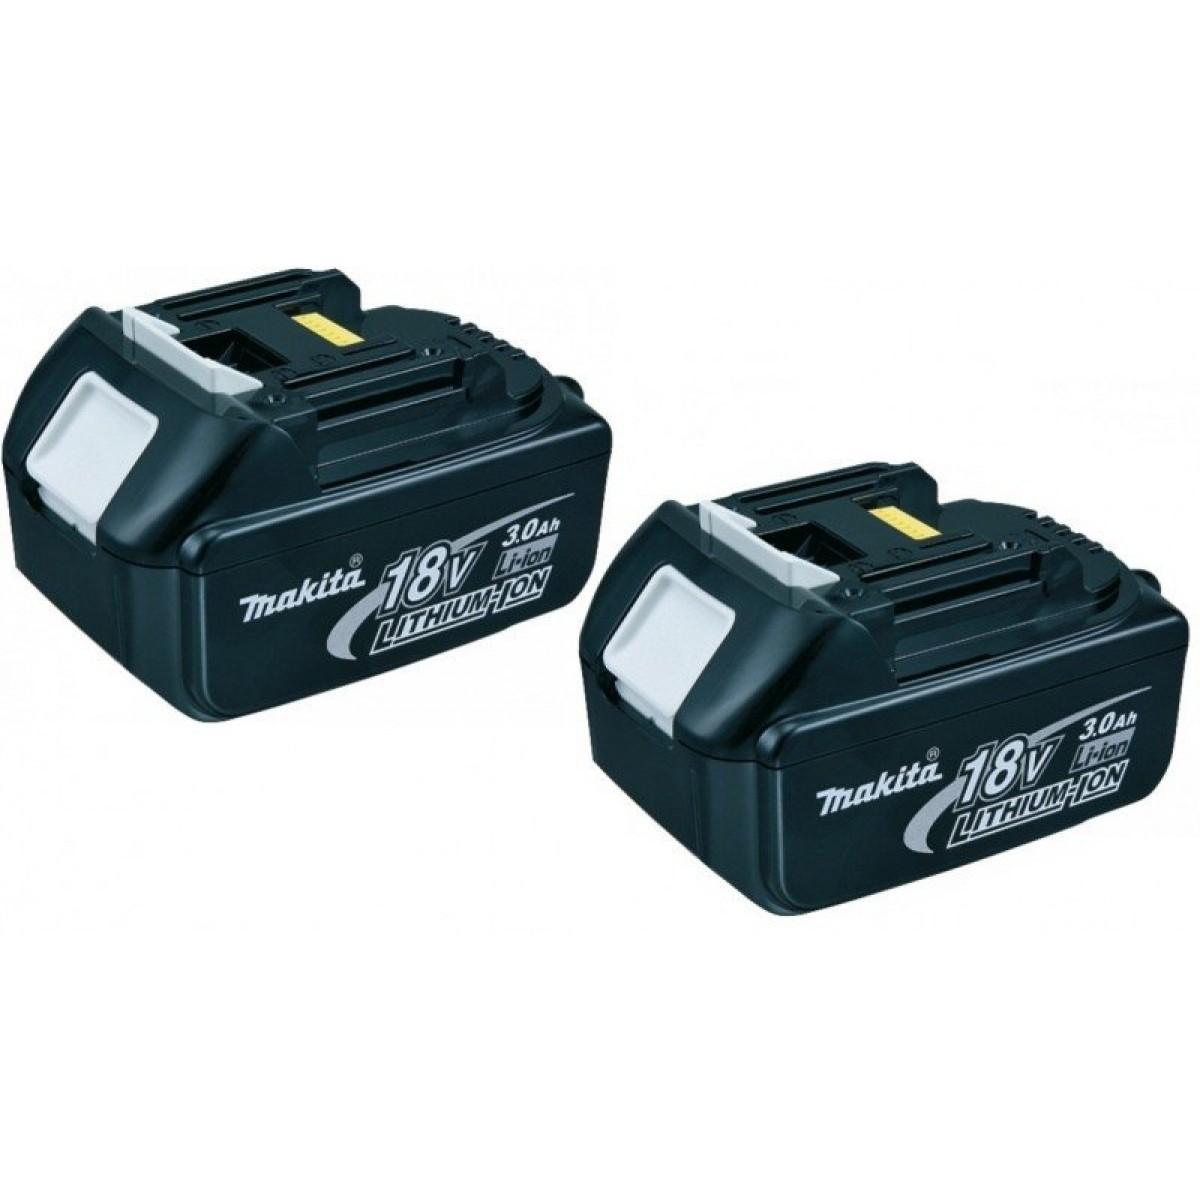 Makita 2x18V Batteri 3,0Ah-31